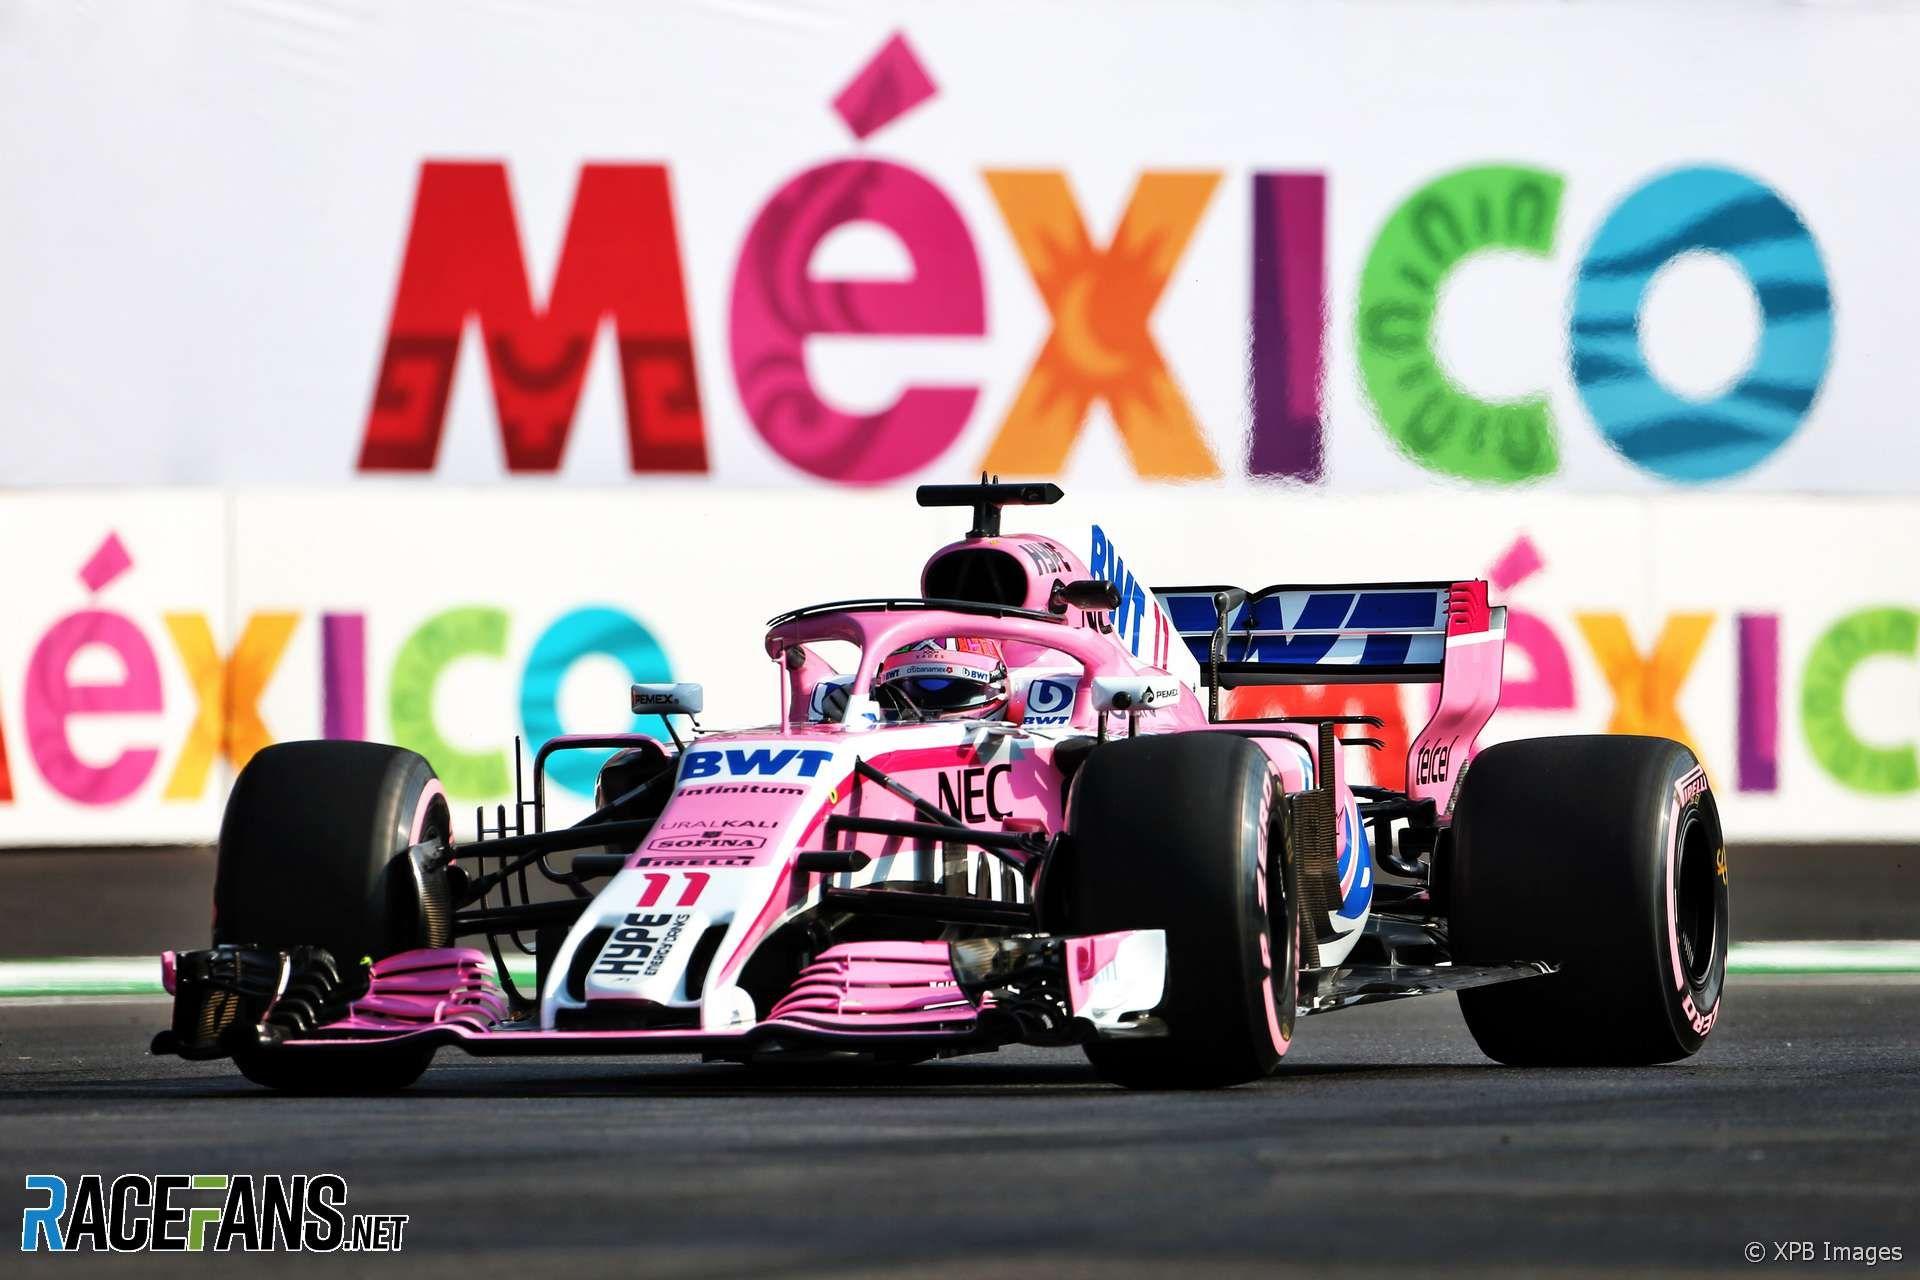 Sergio Perez, Force India, Autodromo Hermanos Rodriguez